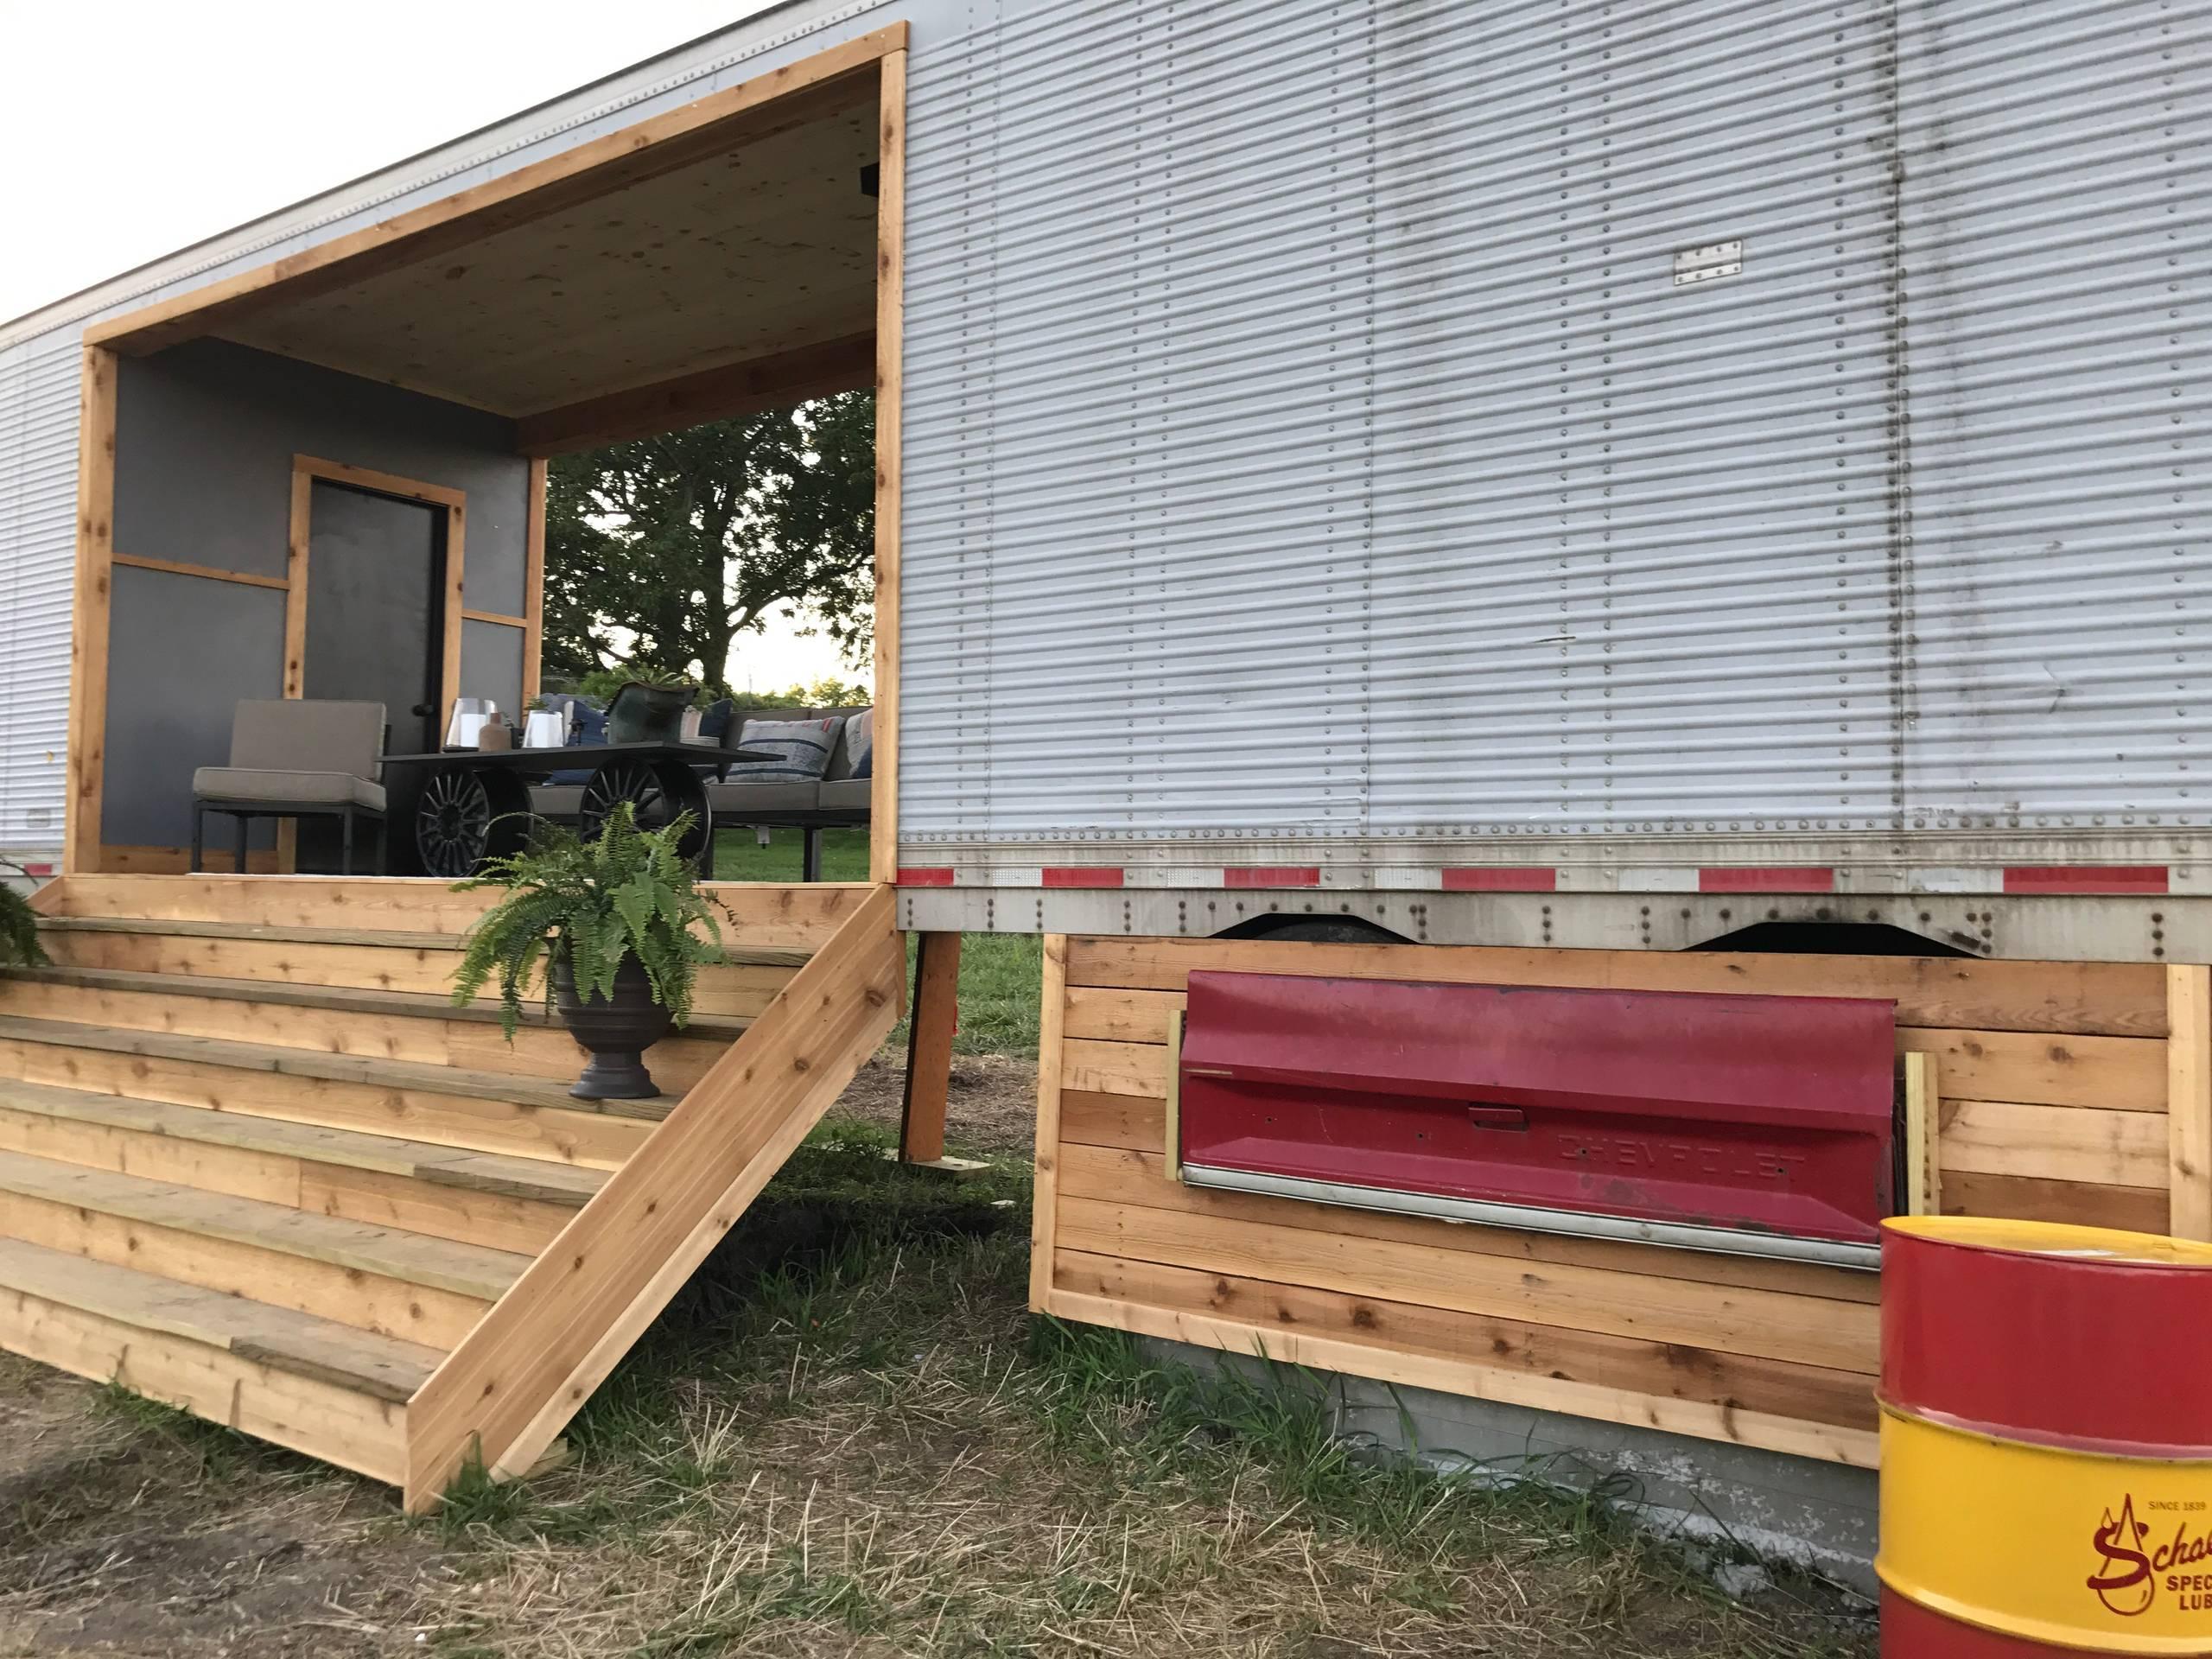 Vintage semi trailer reno turned tiny home